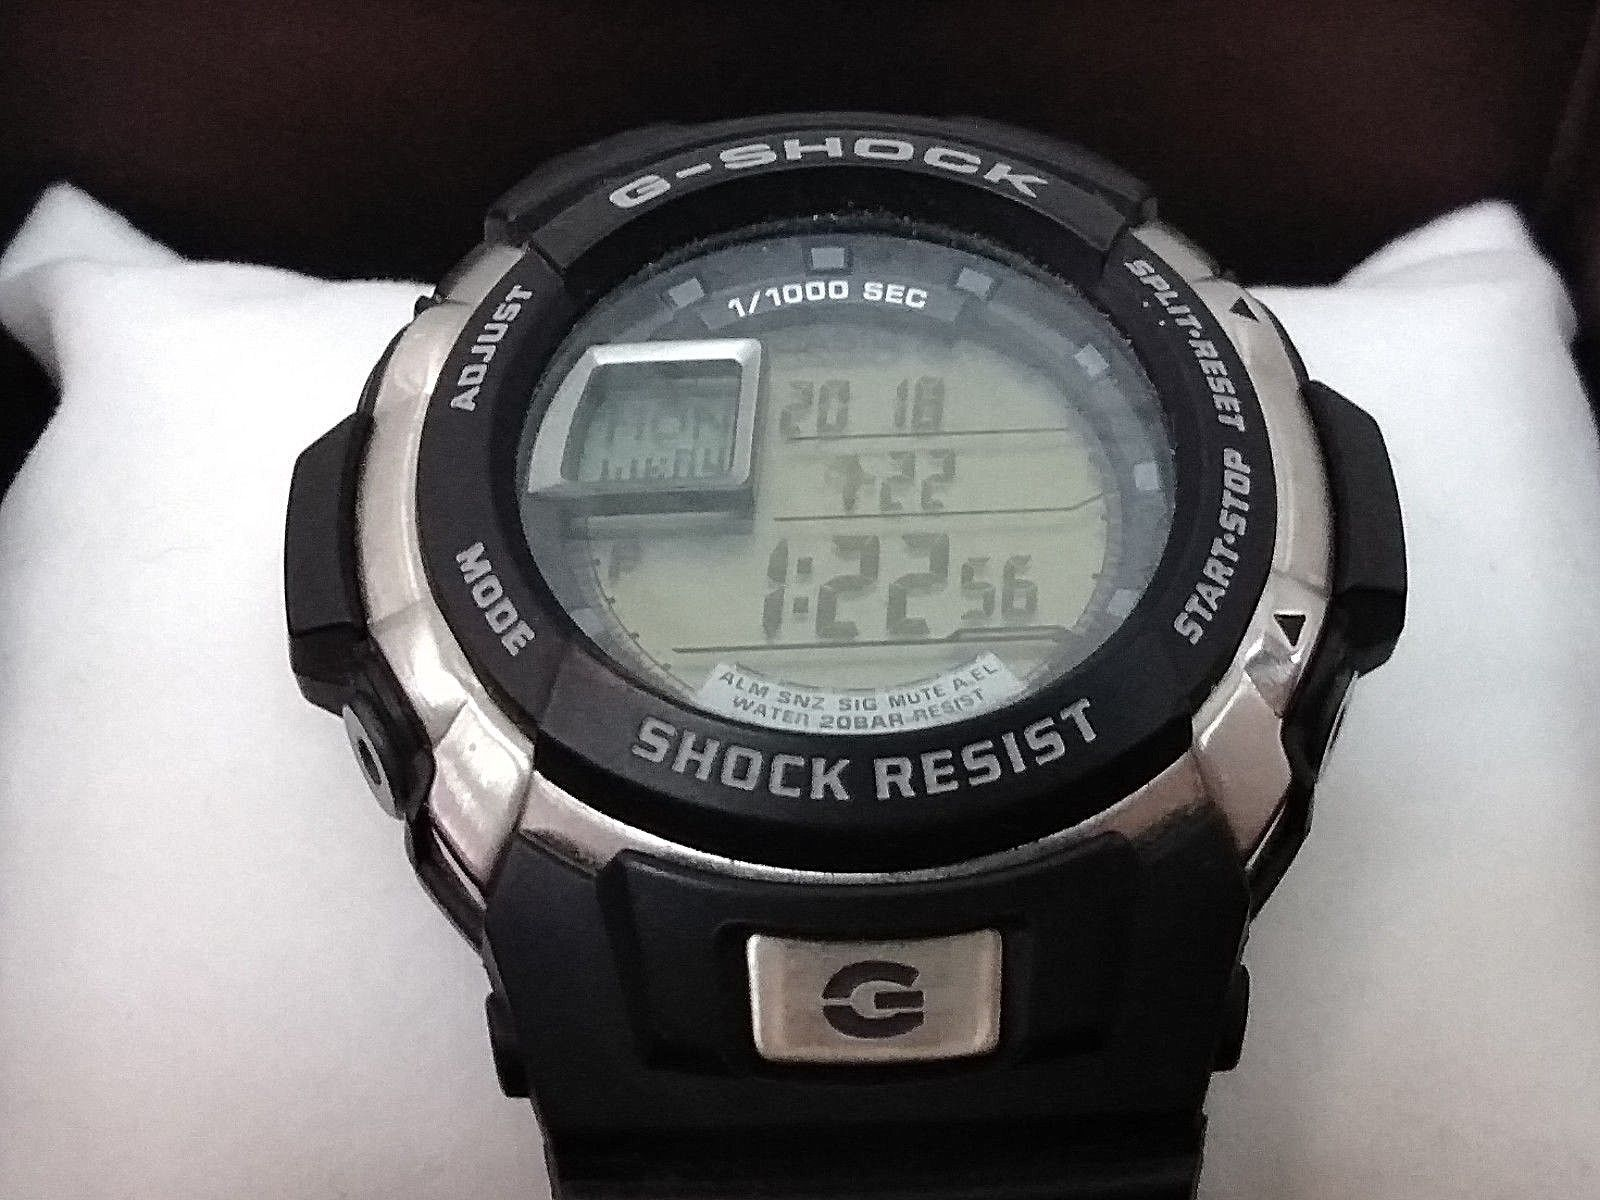 Casio G-Shock G-7700 3095 Digital Watch